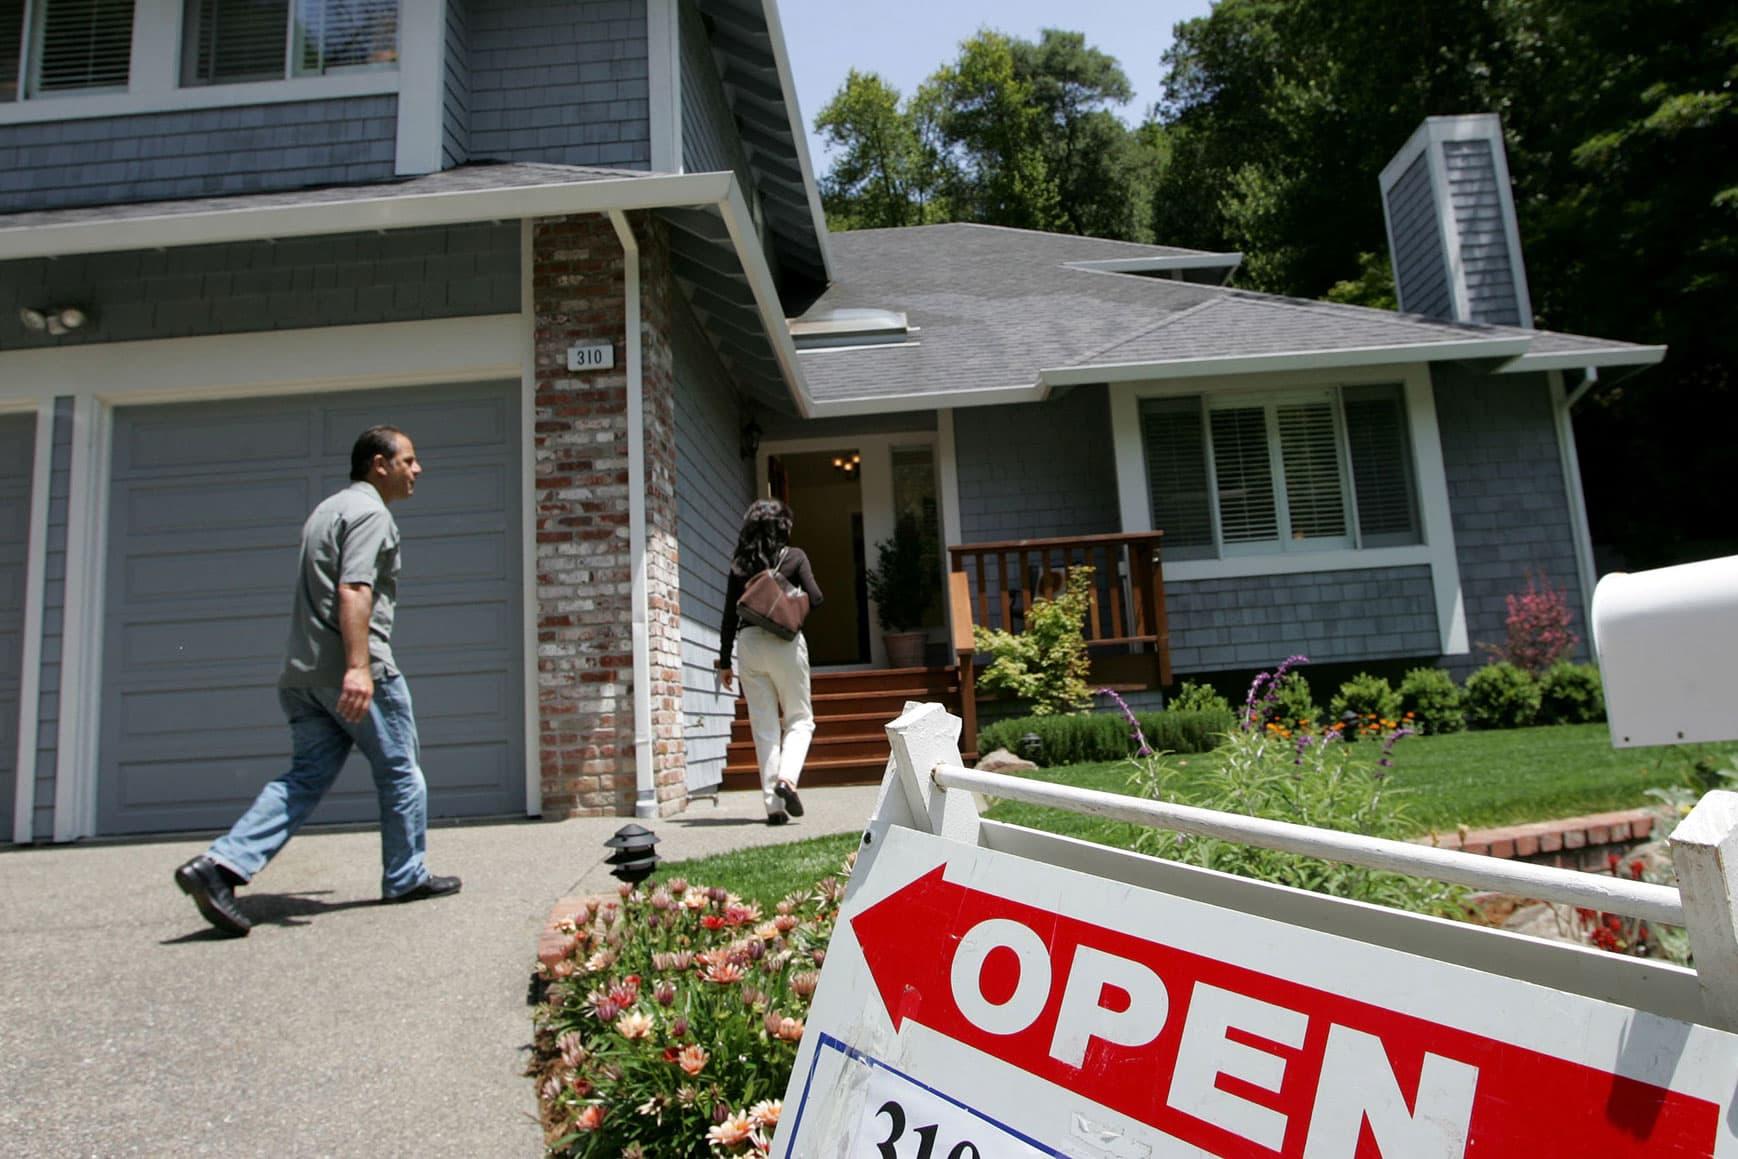 Weekly mortgage refinances spike 26%, with help from coronavirus